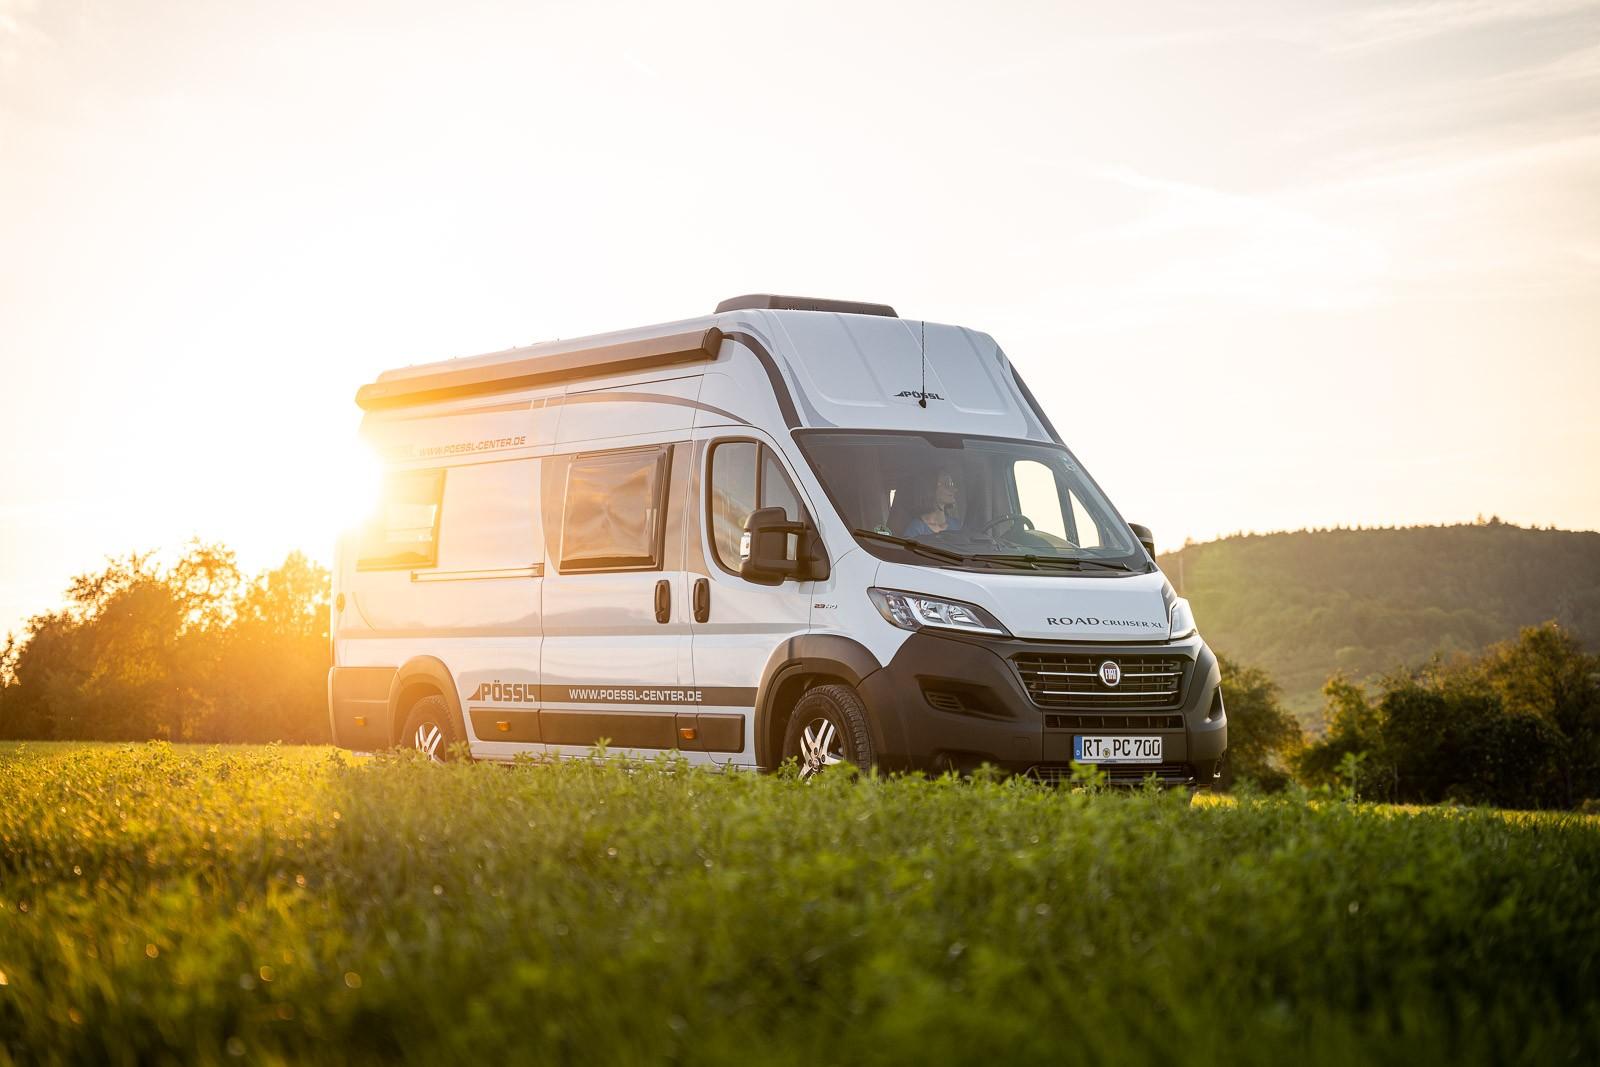 Pössl Roadcruiser XL beim Sonnenuntergang in den Natur